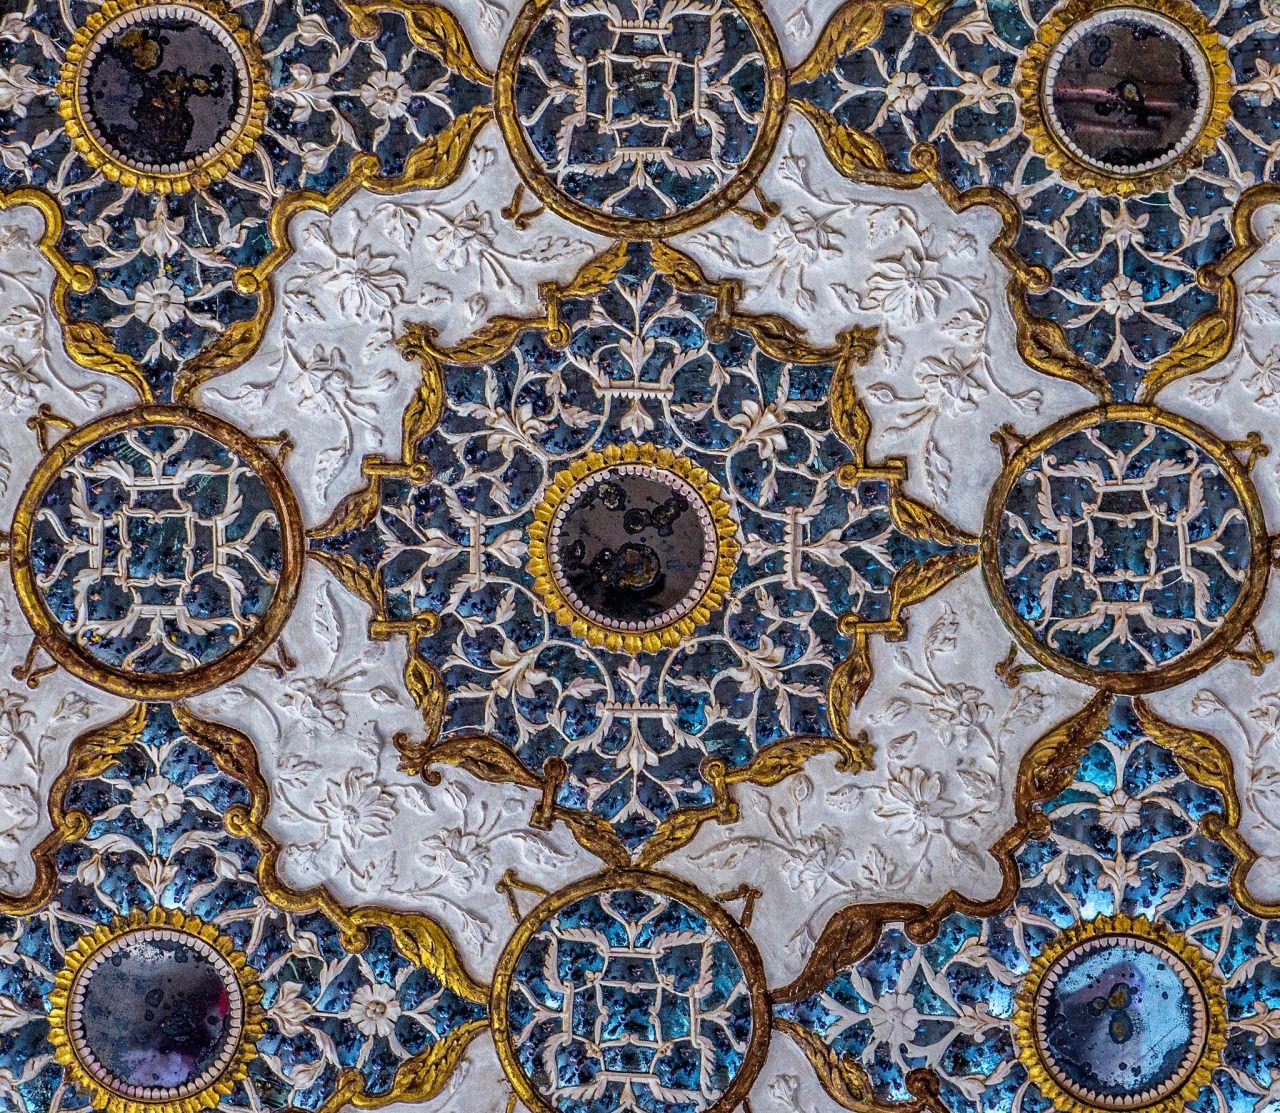 Pin By Adil Taj On Ceiling In 2019: Amer, Jaipur, Rajasthan, India